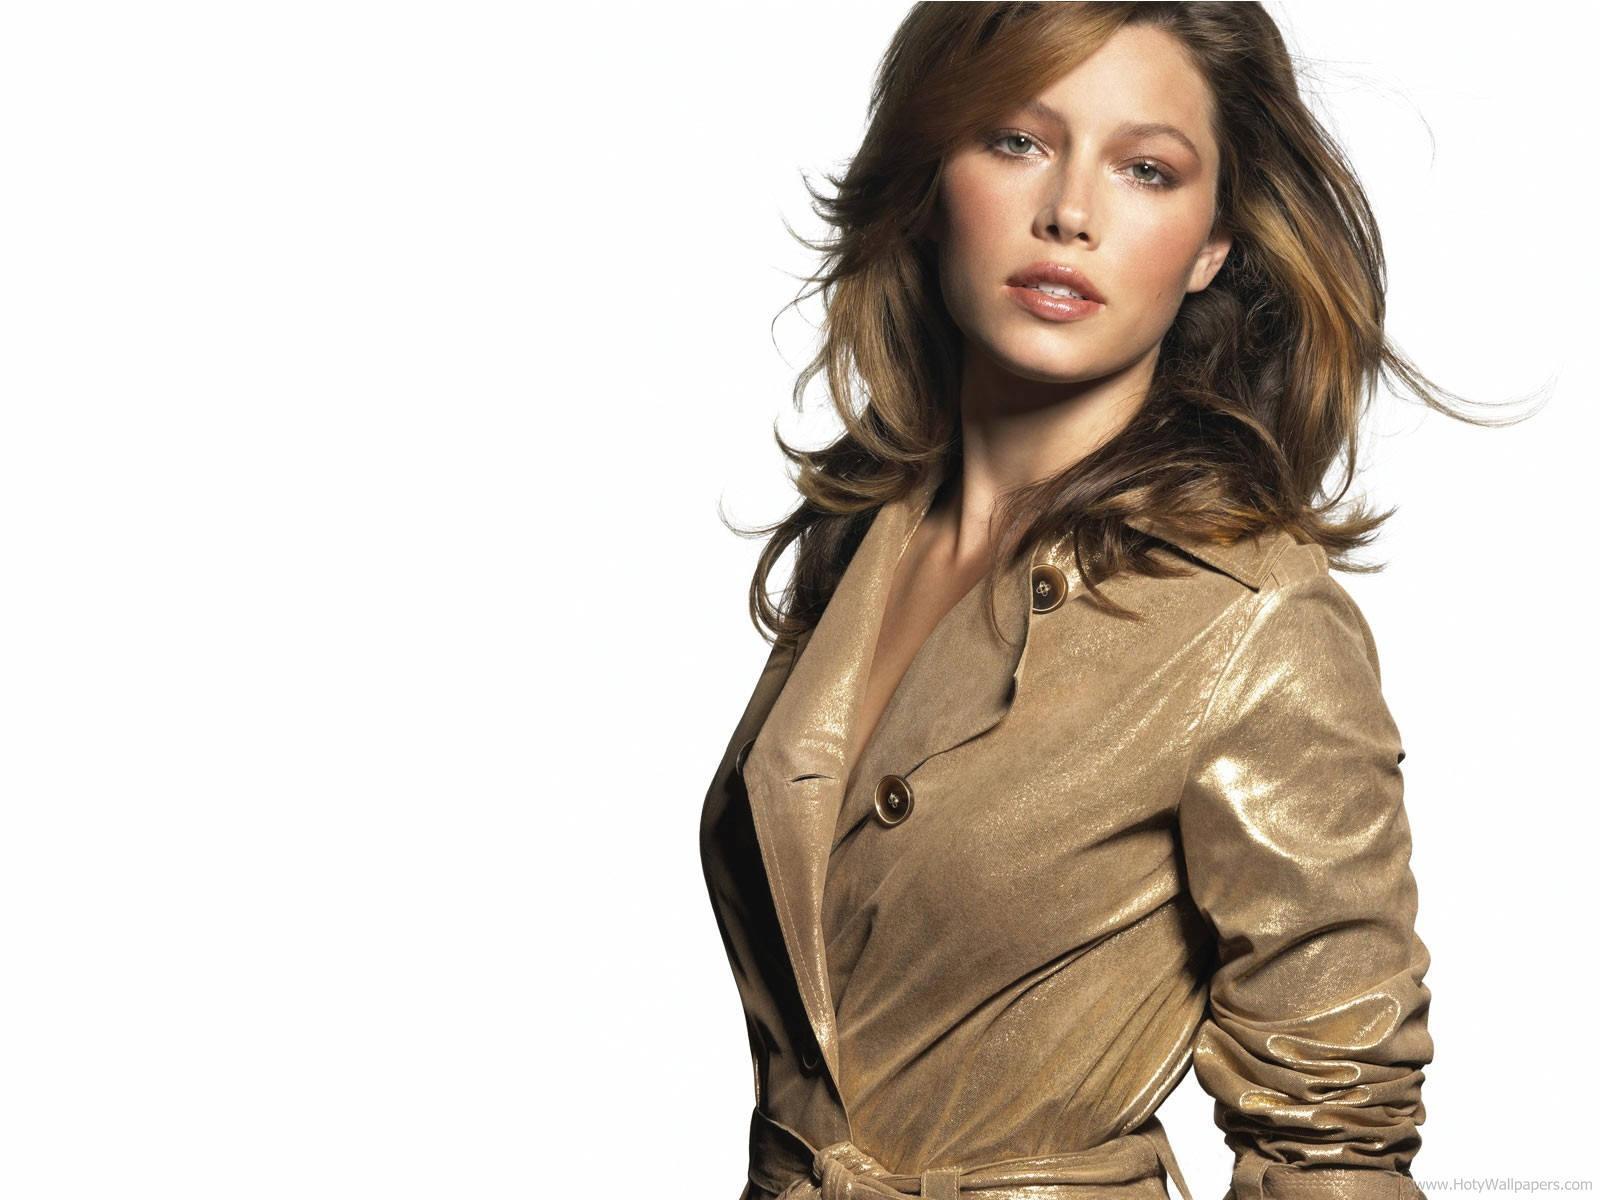 http://2.bp.blogspot.com/-qJWxdJFtl2M/TraOUHOxRAI/AAAAAAAAPc4/dtXc5yVbCHw/s1600/jessica_biel_actress_galmor_wallpaper-05-1600x1200.jpg